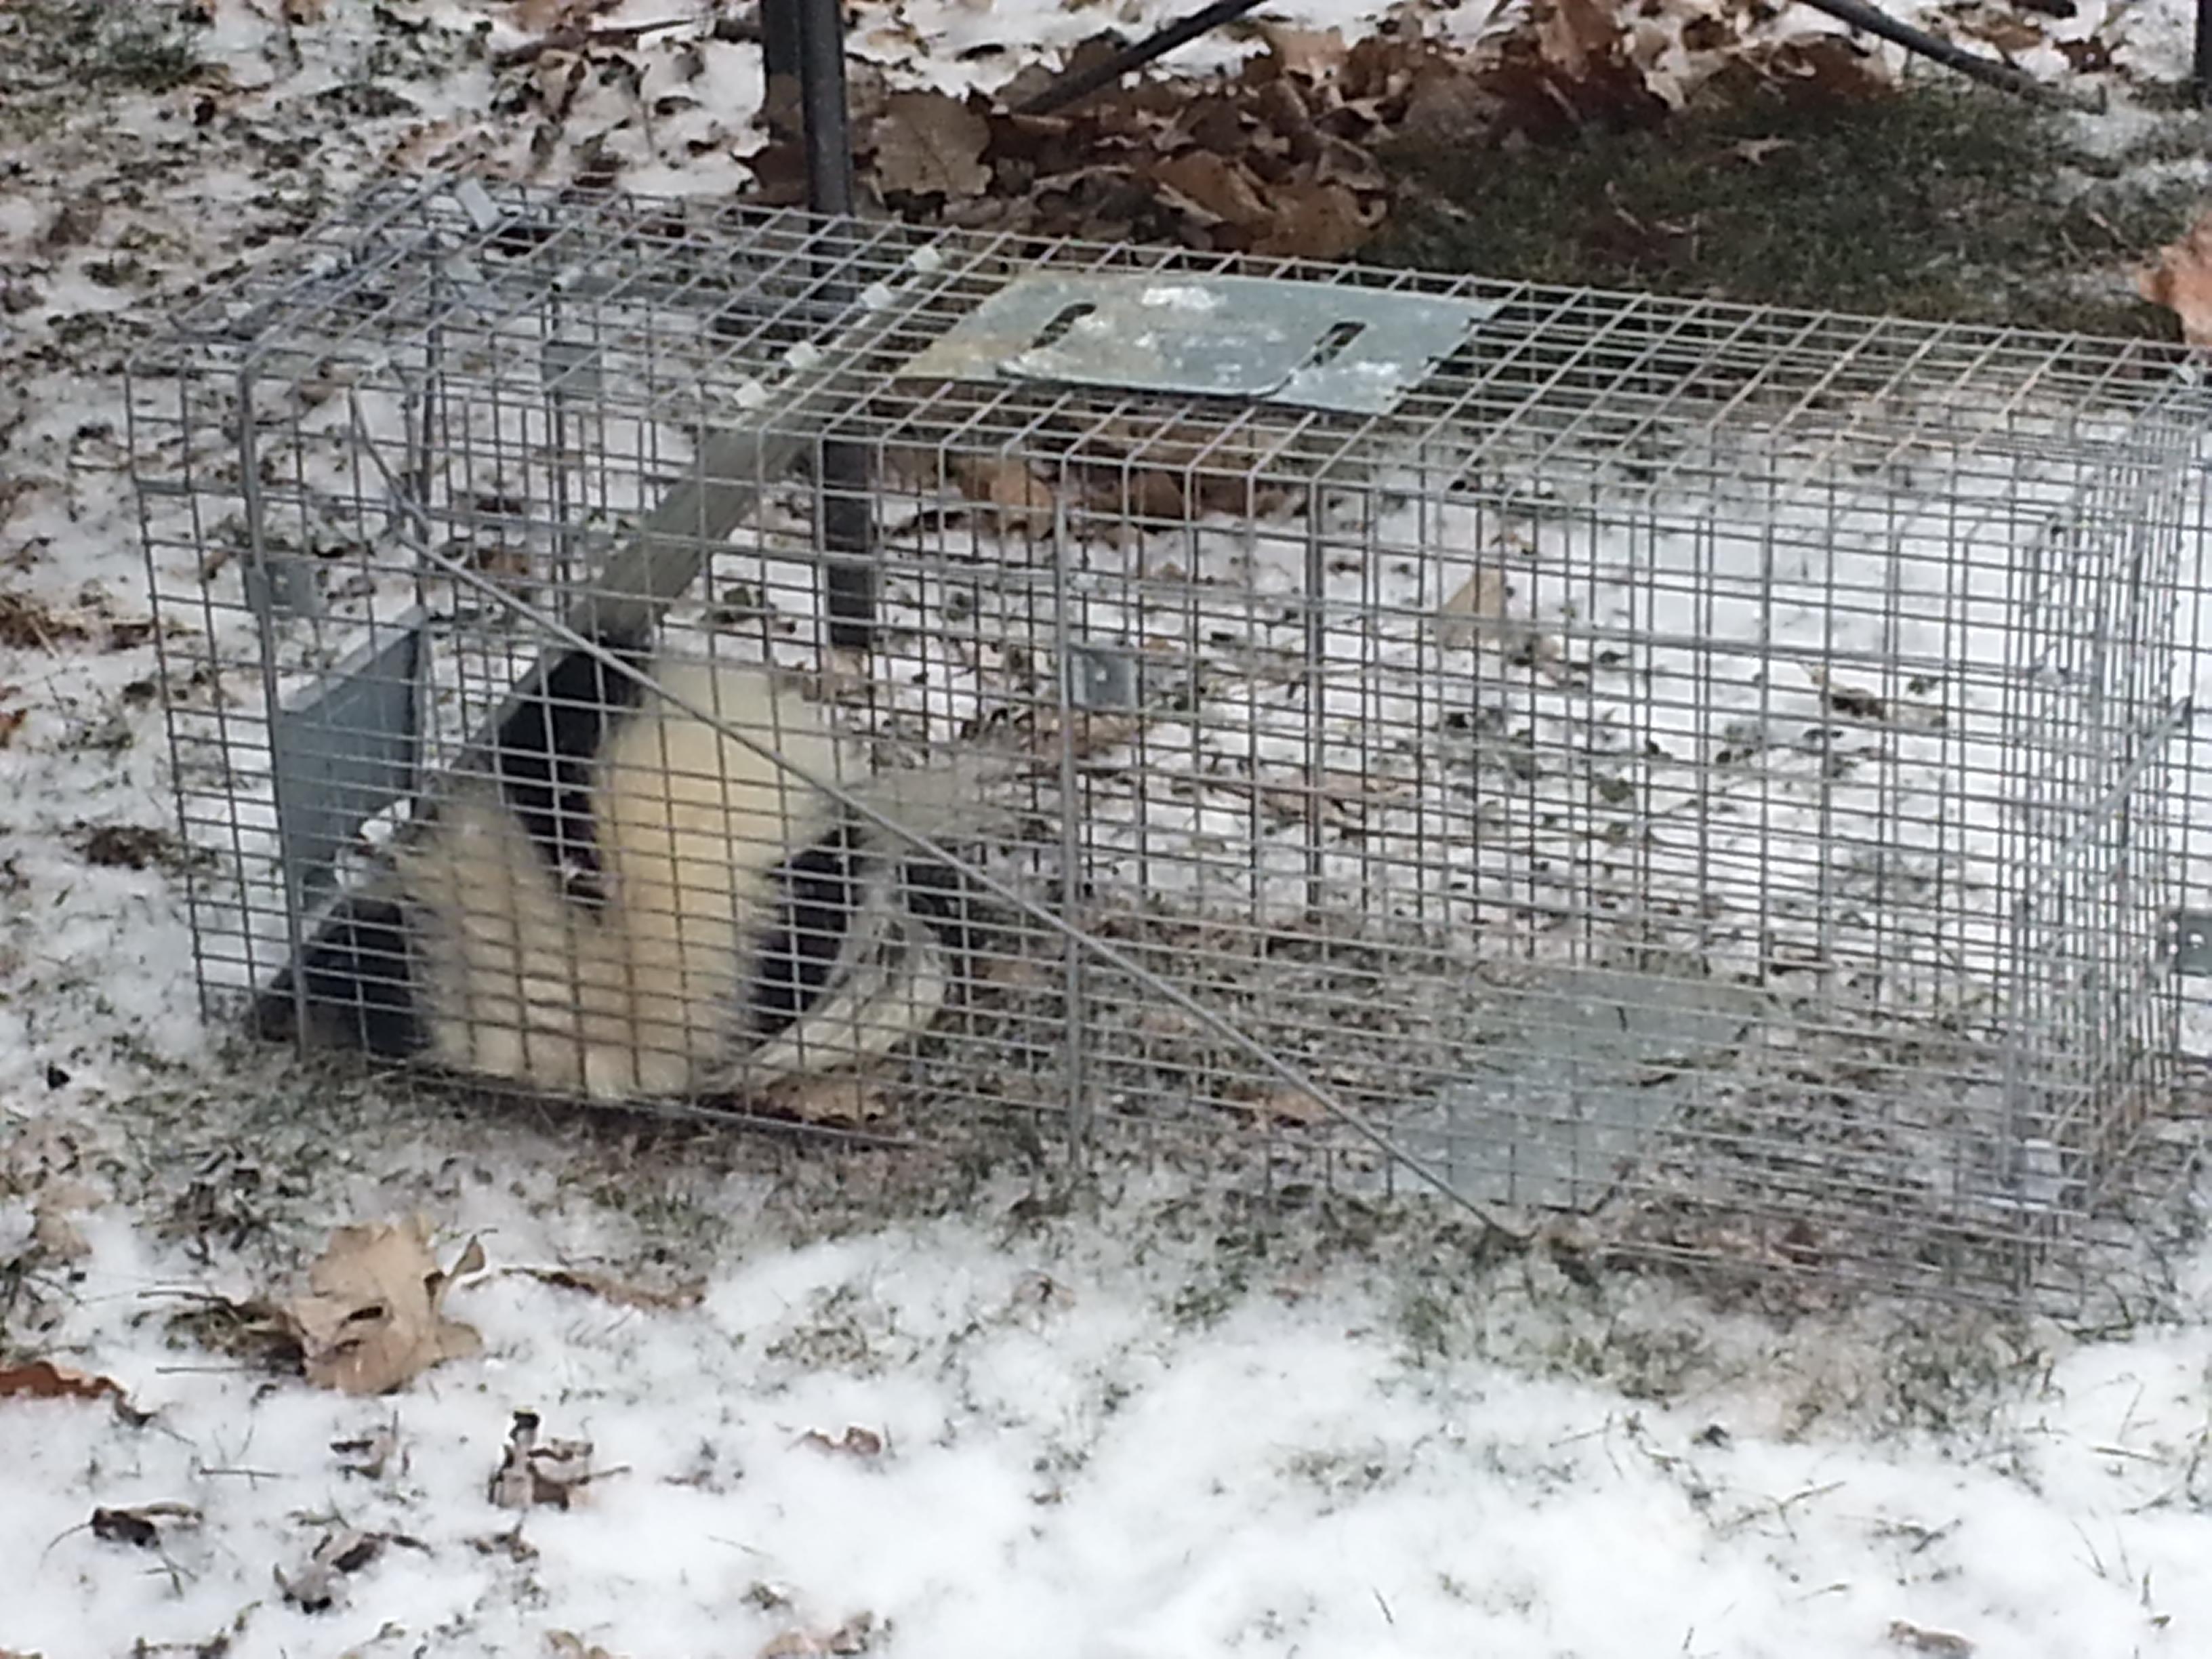 skunk in a trap